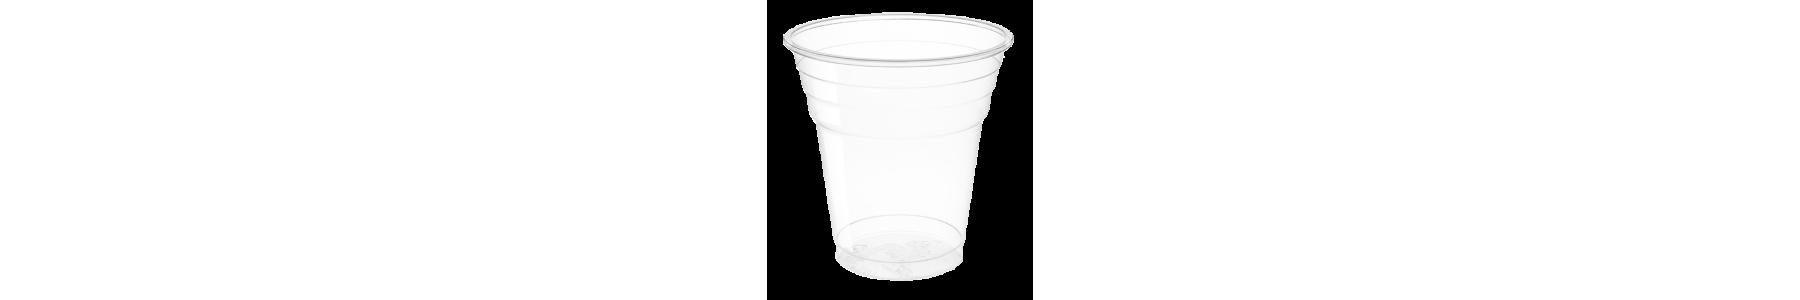 Pahare biodegradabile PLA